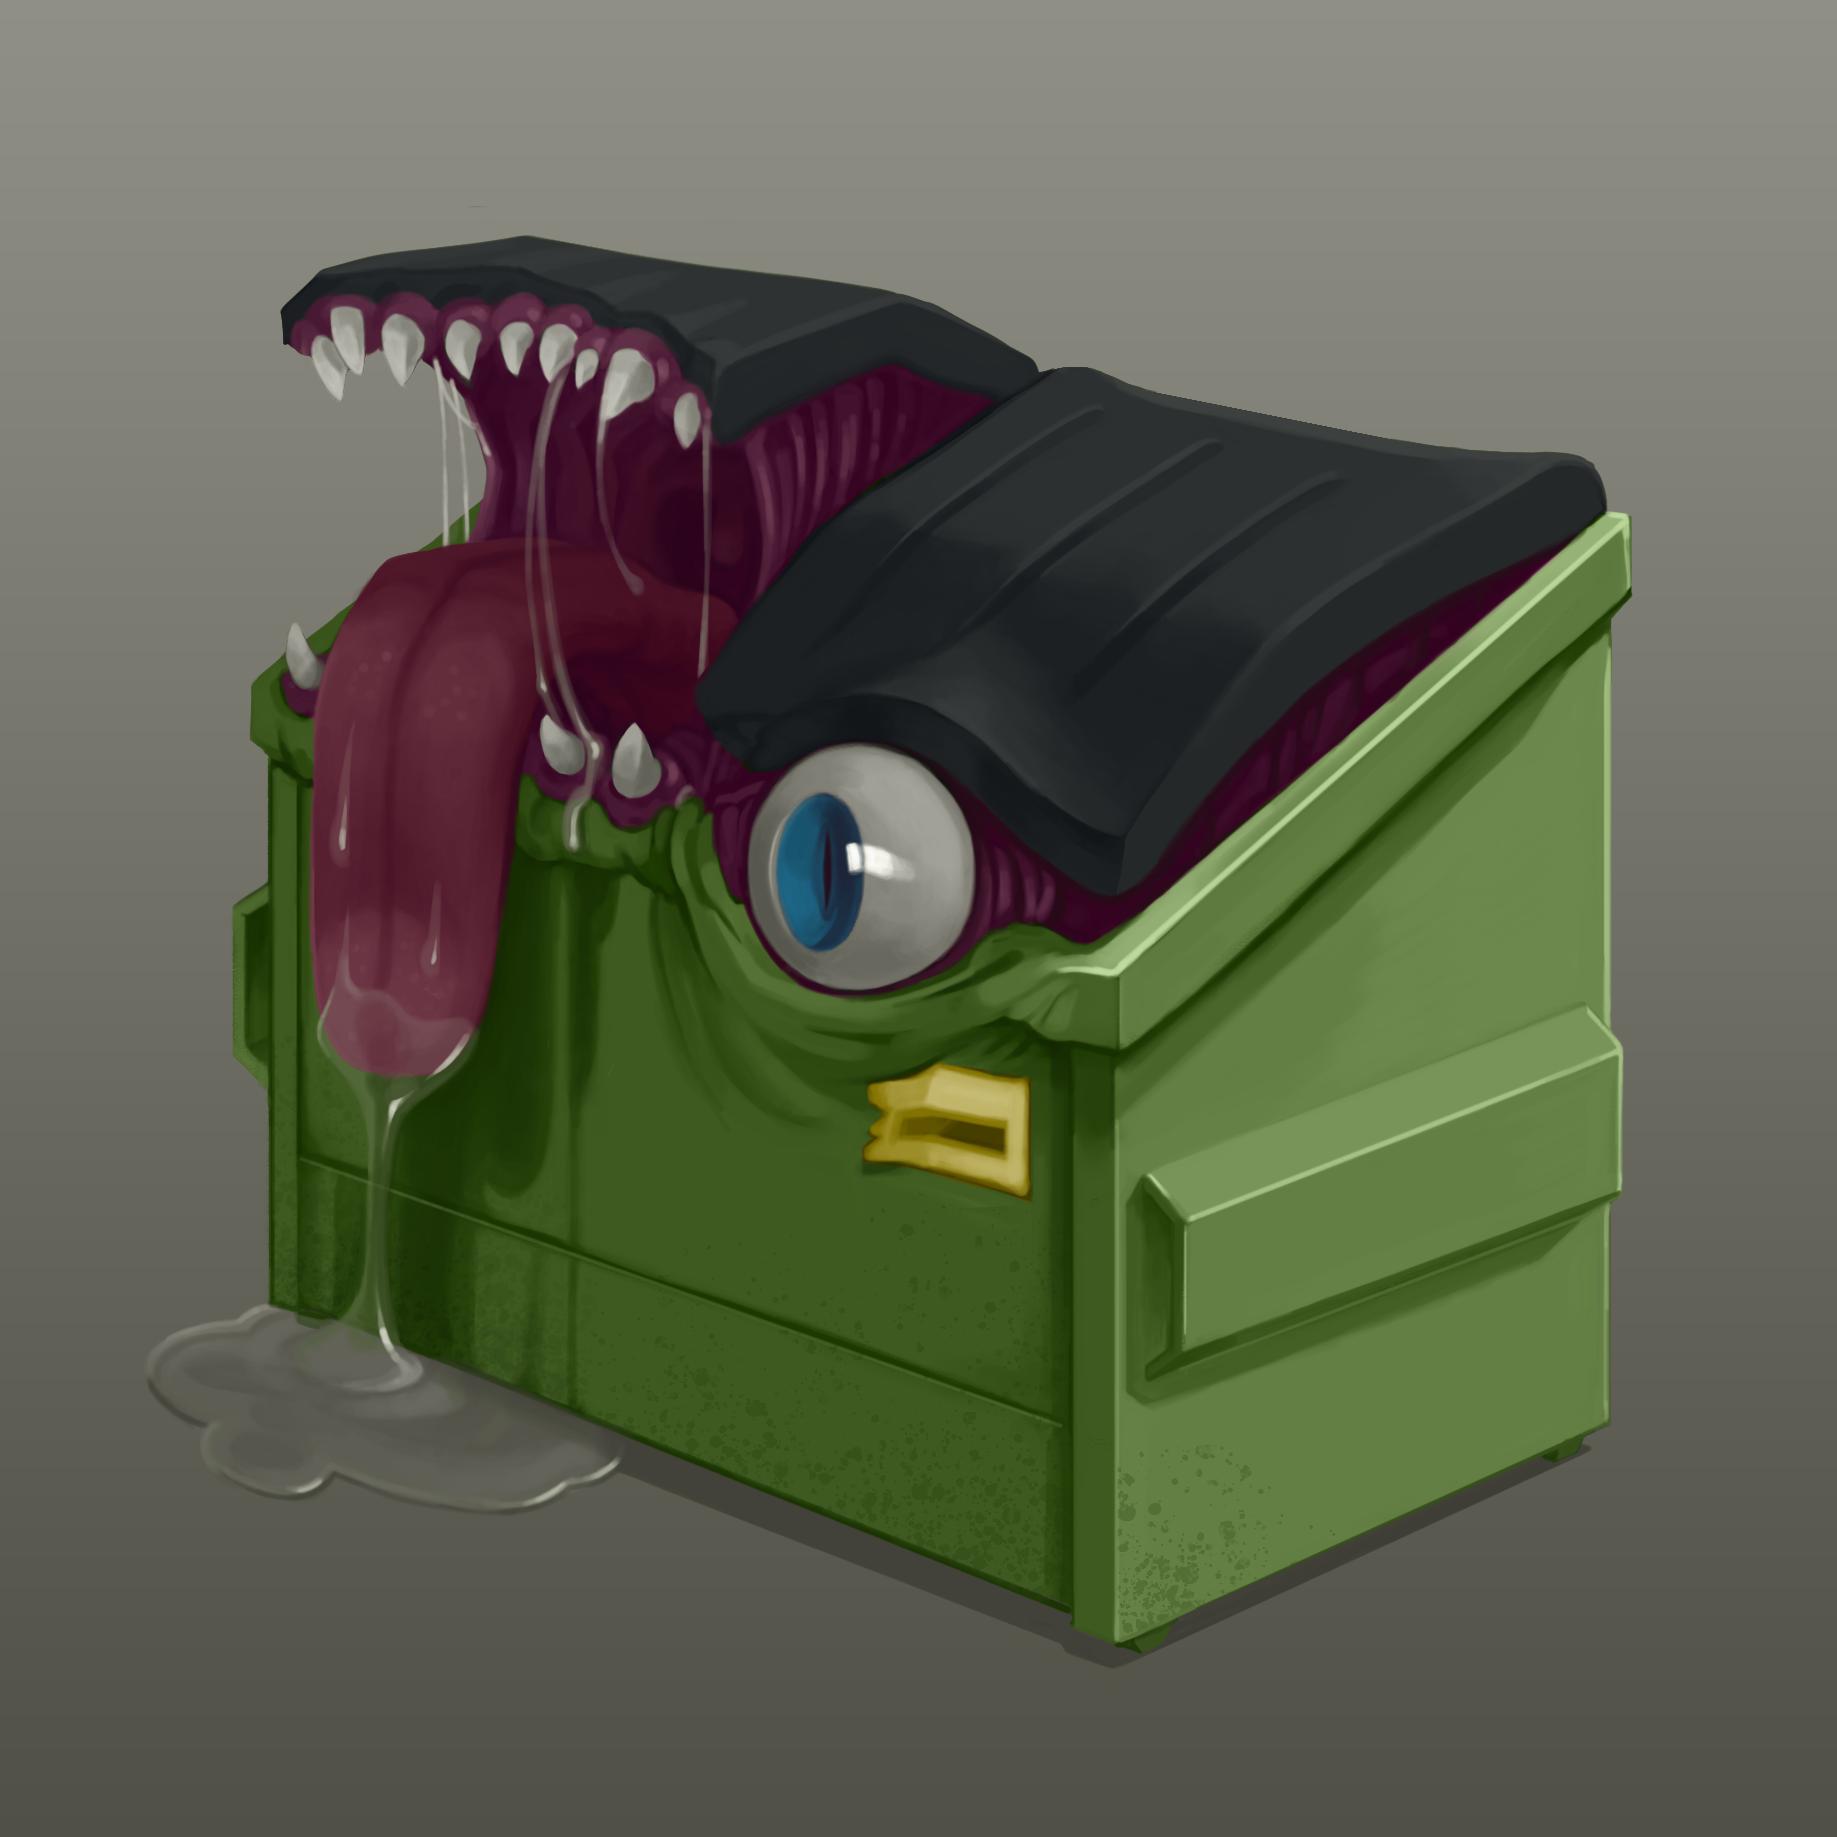 dumpster_mimicC.png